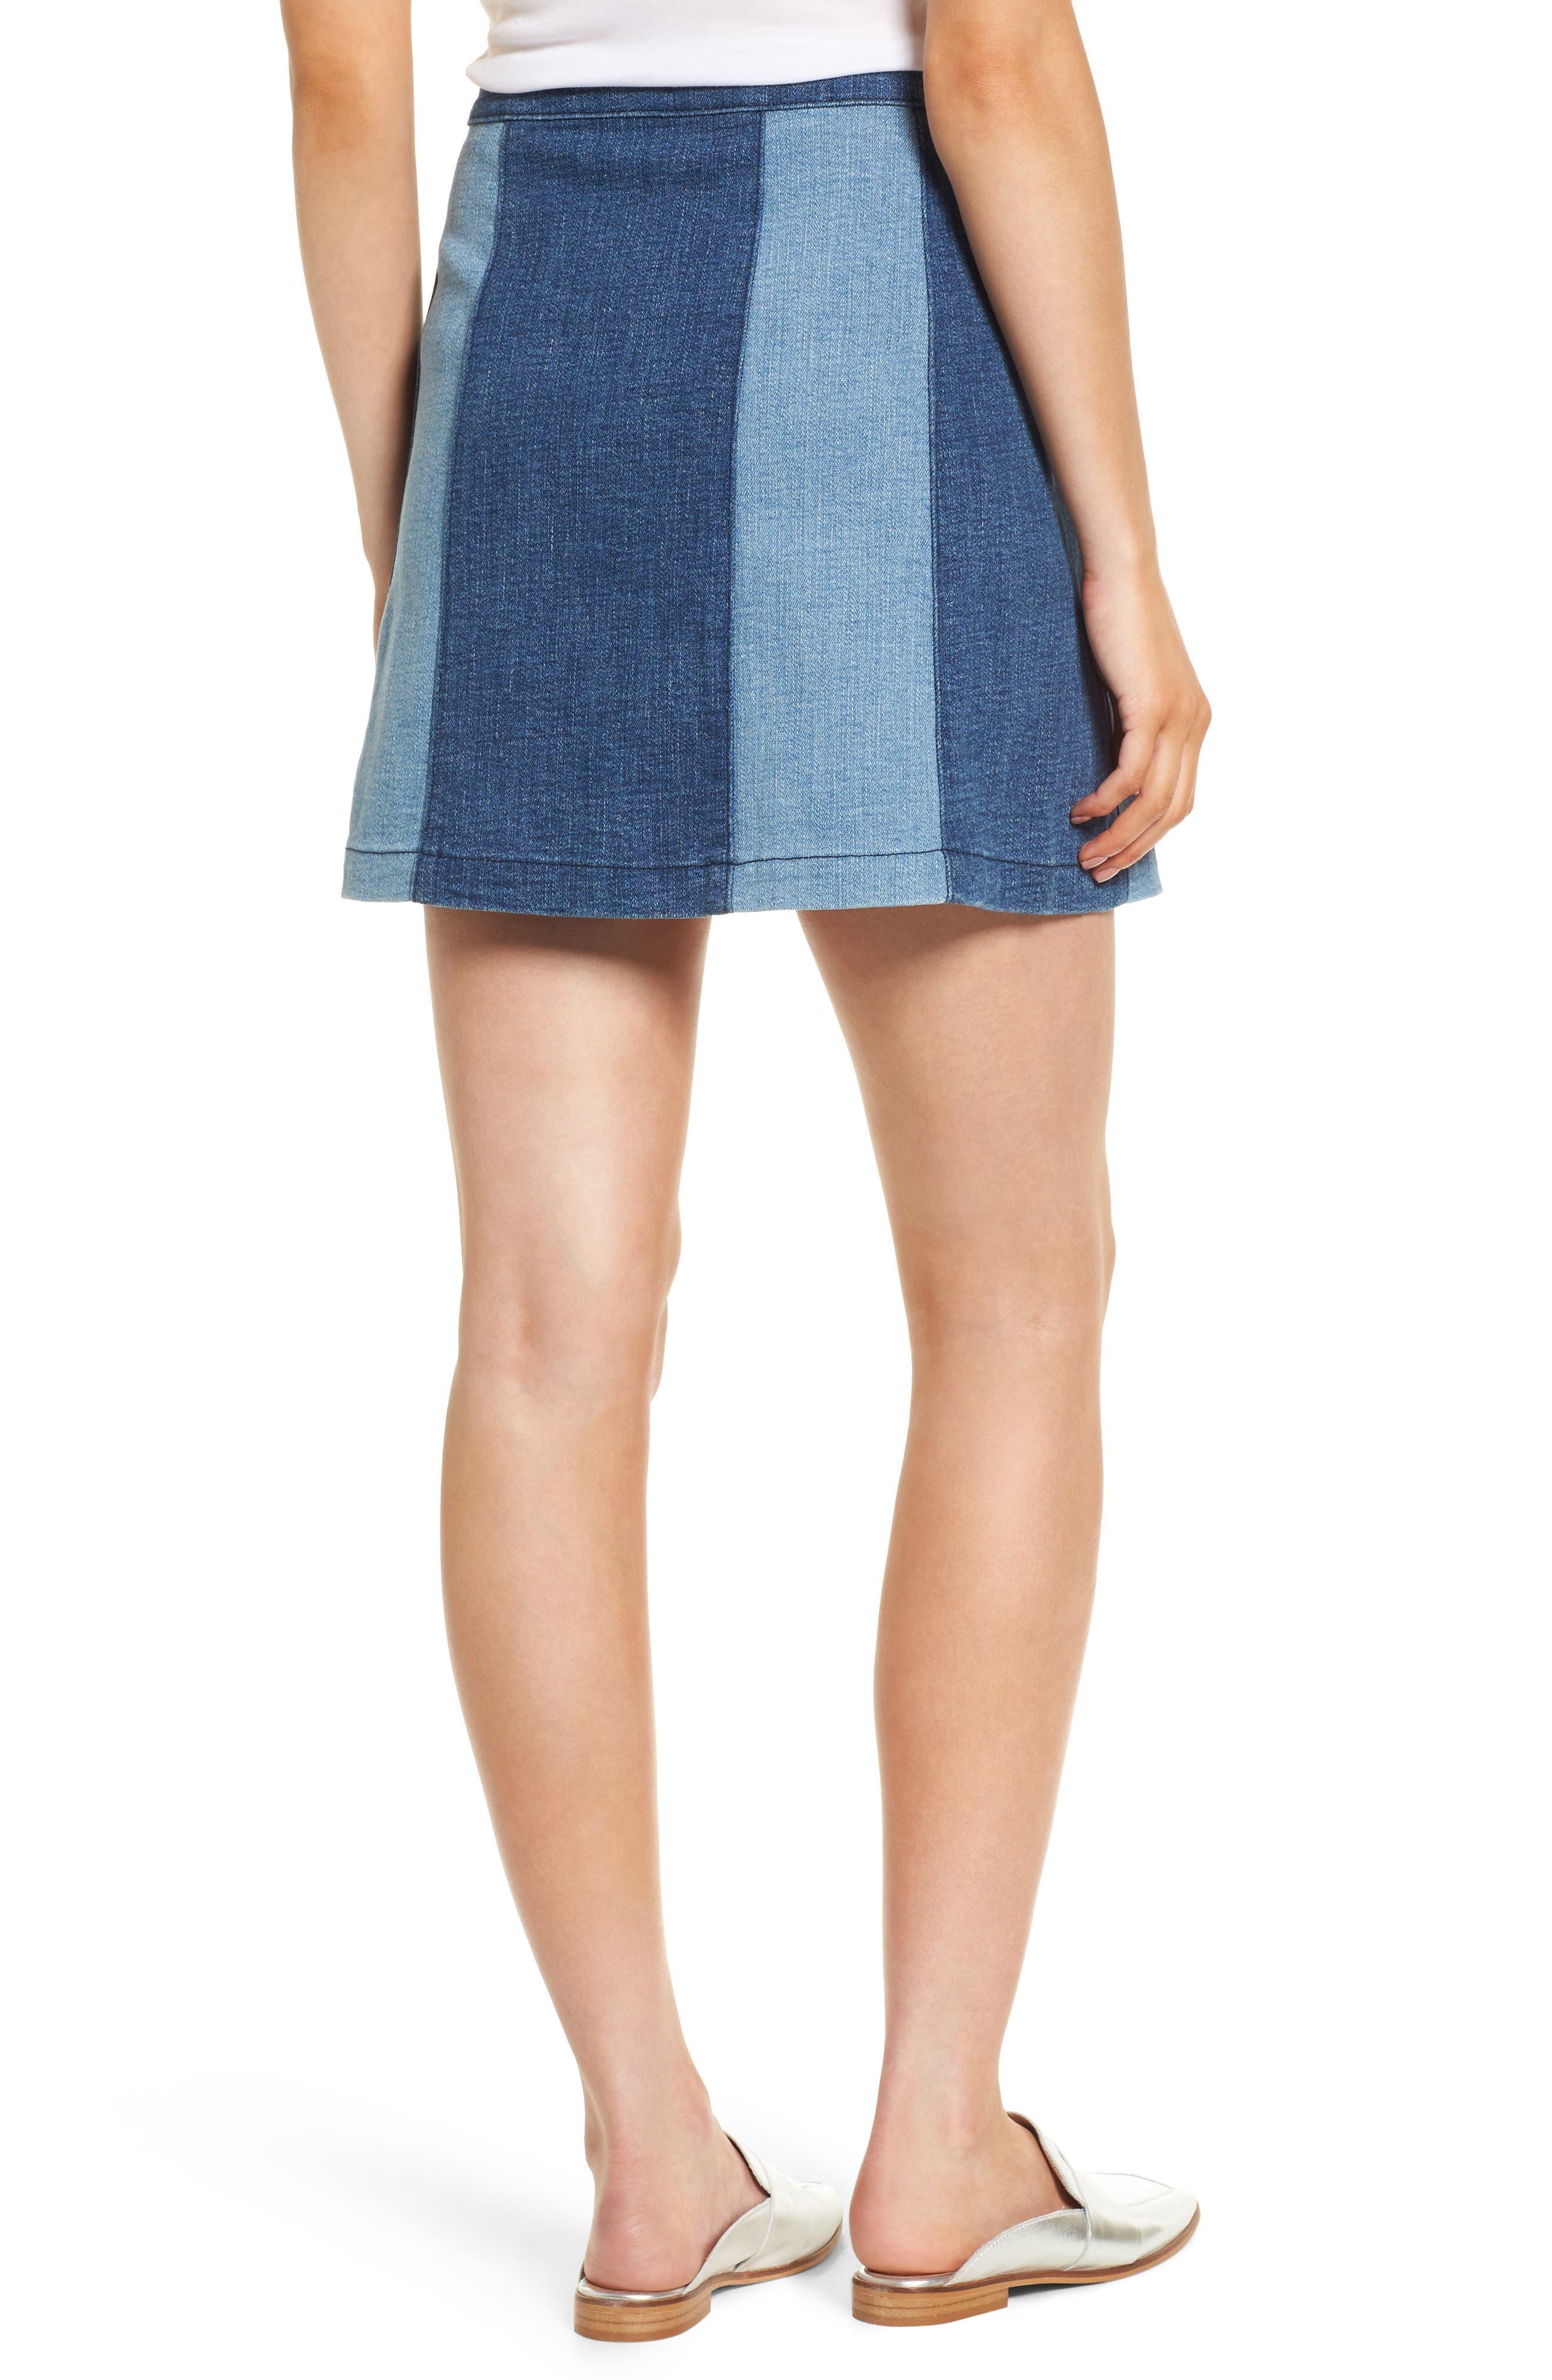 Beatty Denim Miniskirt,                             Alternate thumbnail 2, color,                             Indigo